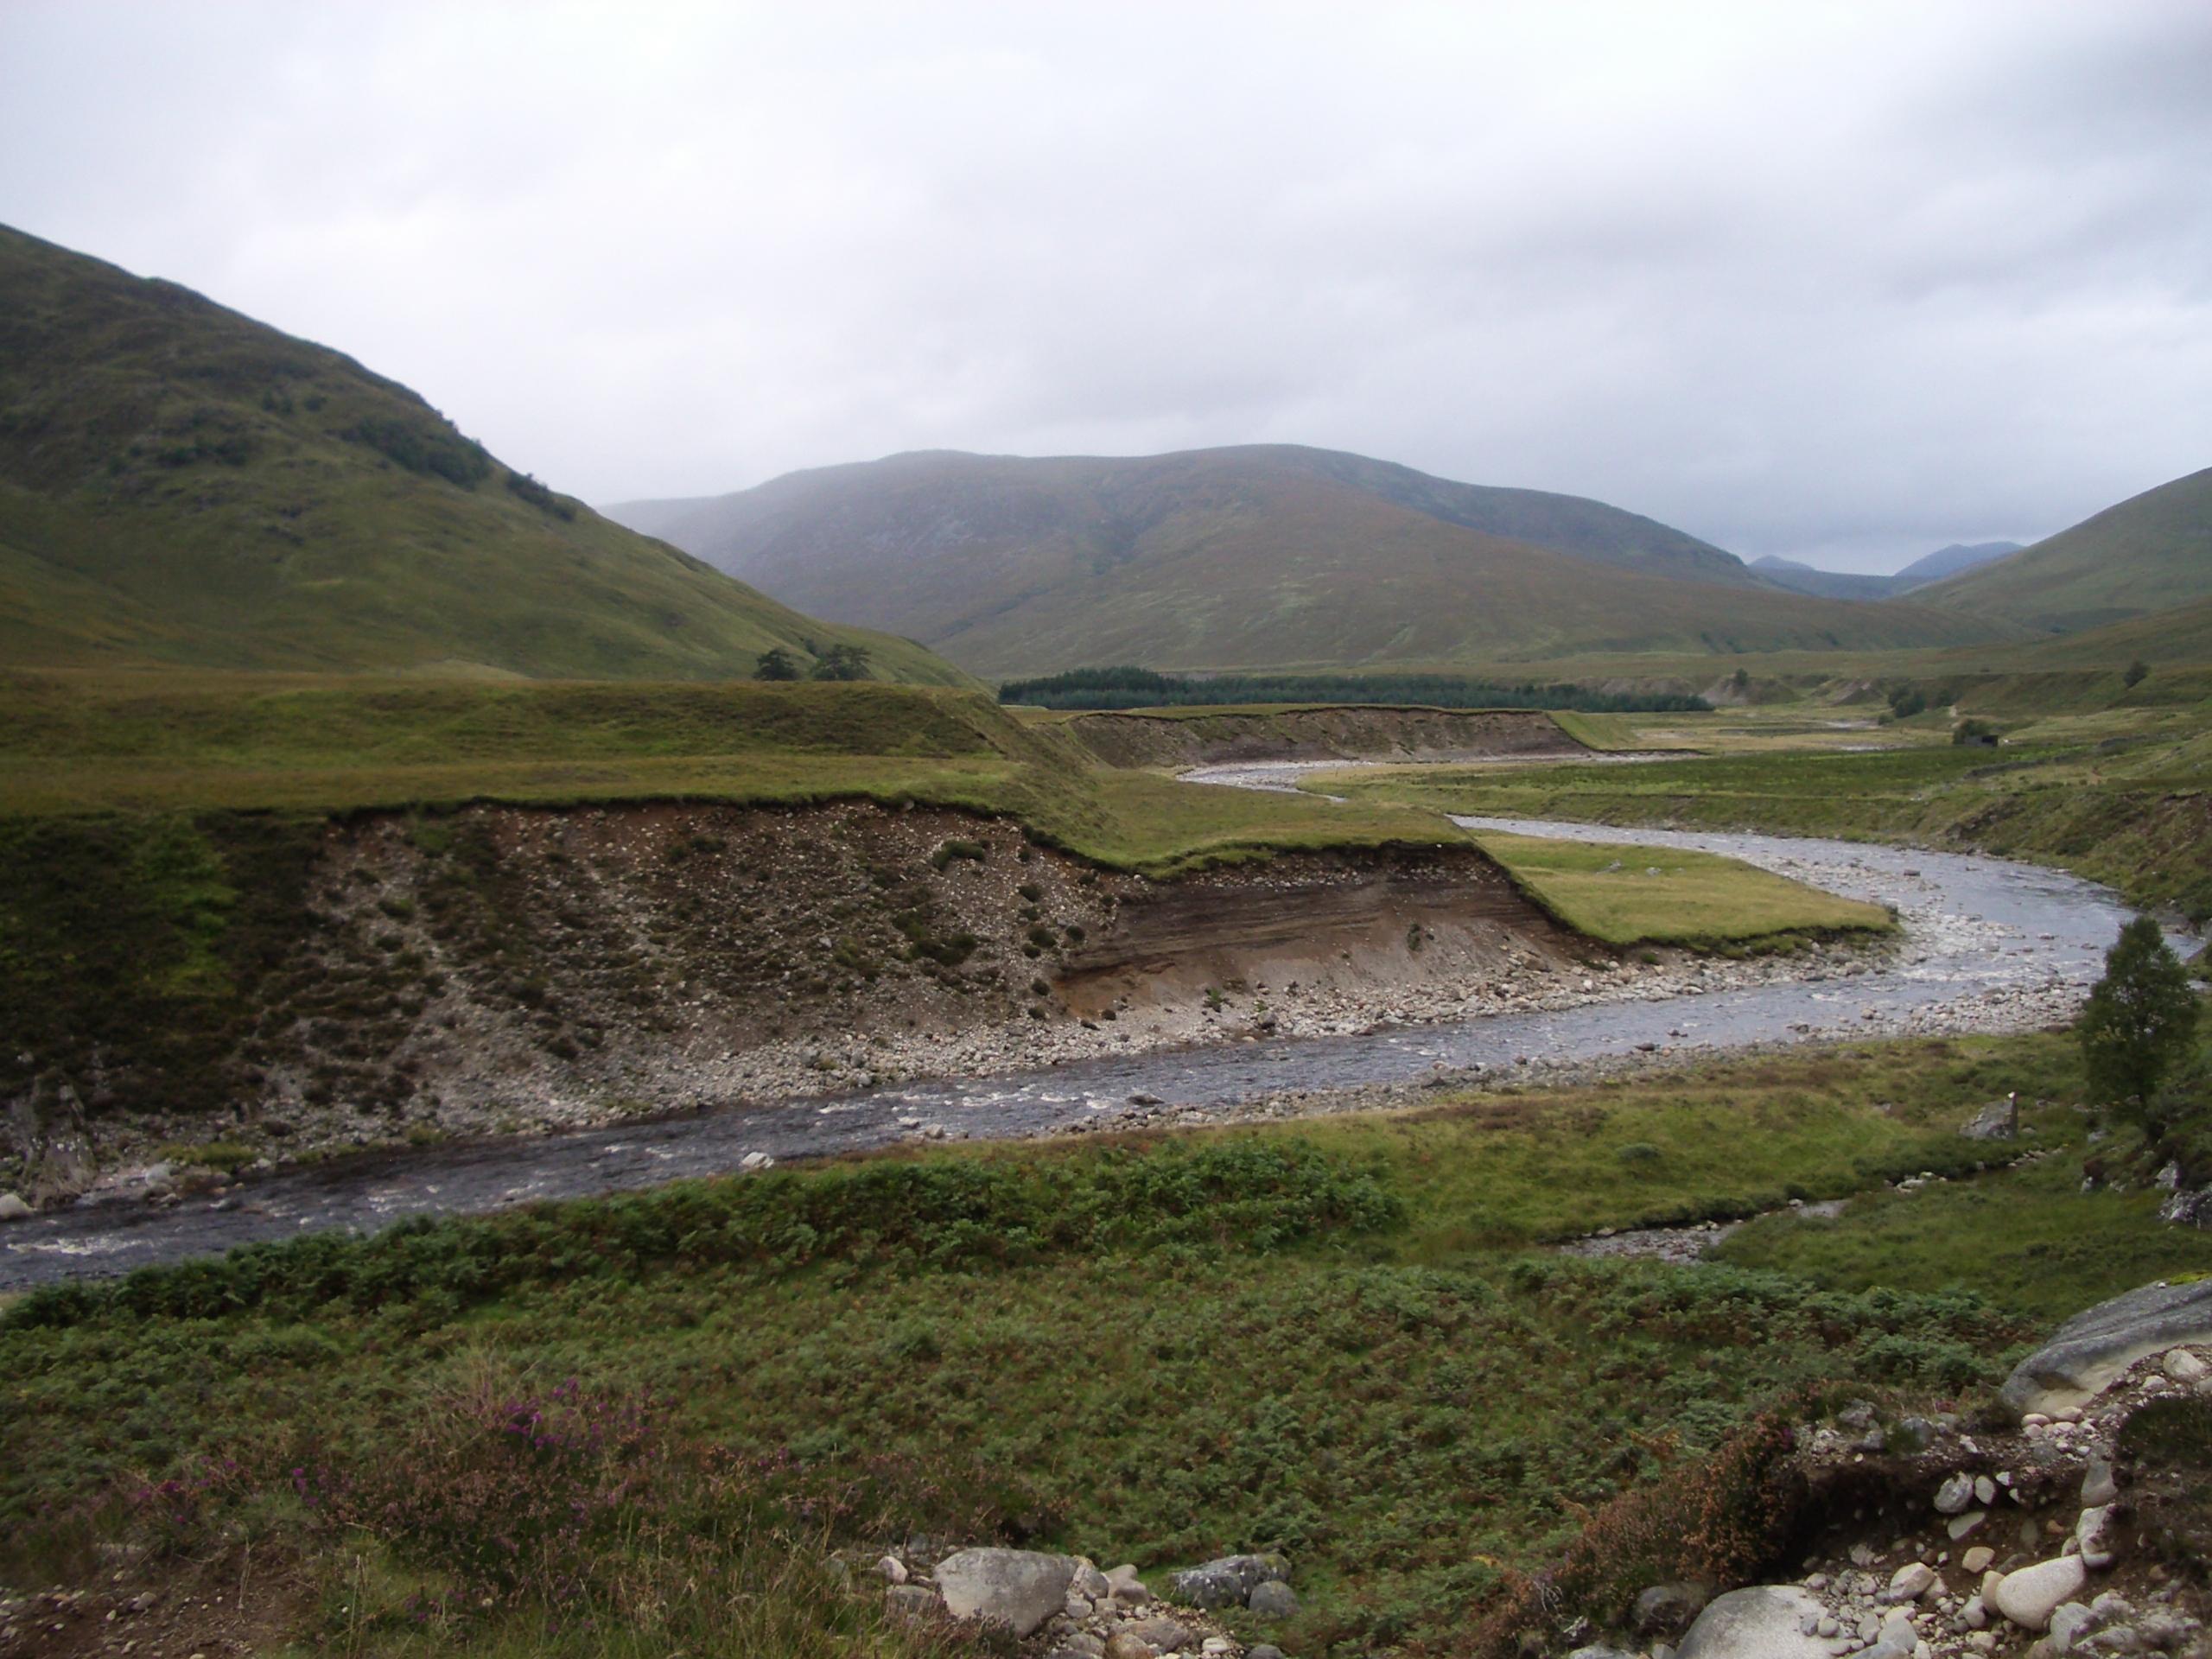 River along several different levels of flat floodplains